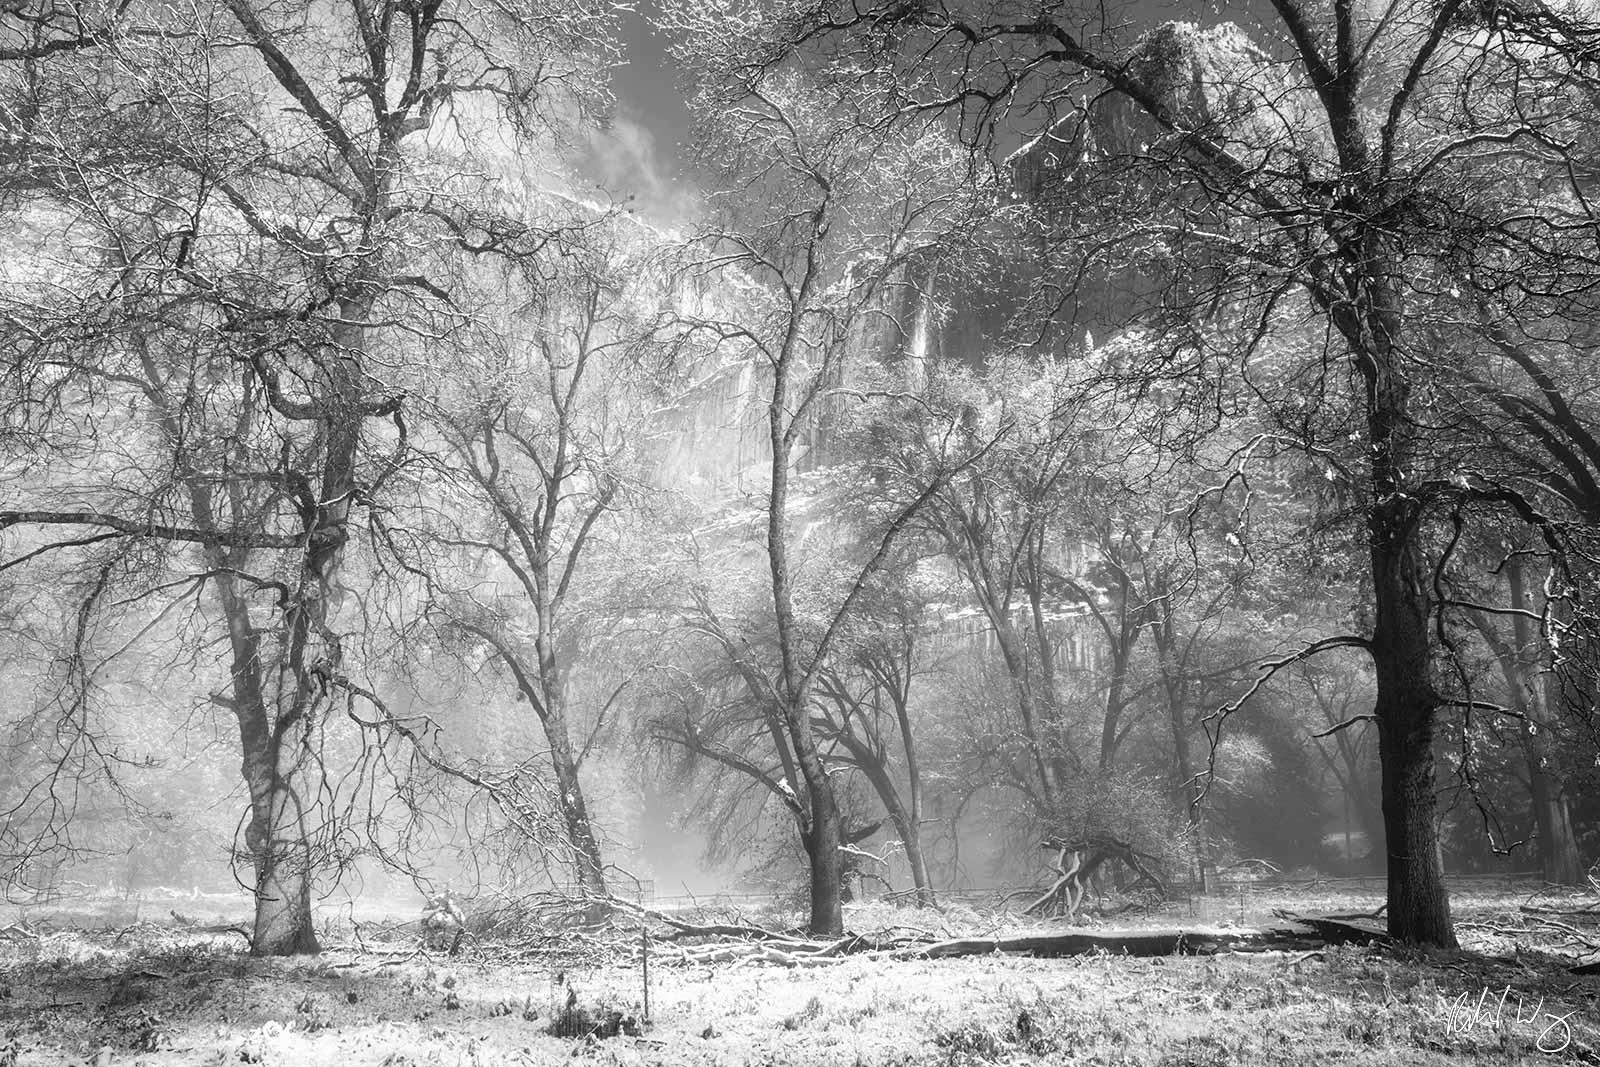 Black and White Photo: Yosemite Falls After Spring Snowstorm, Yosemite National Park, California